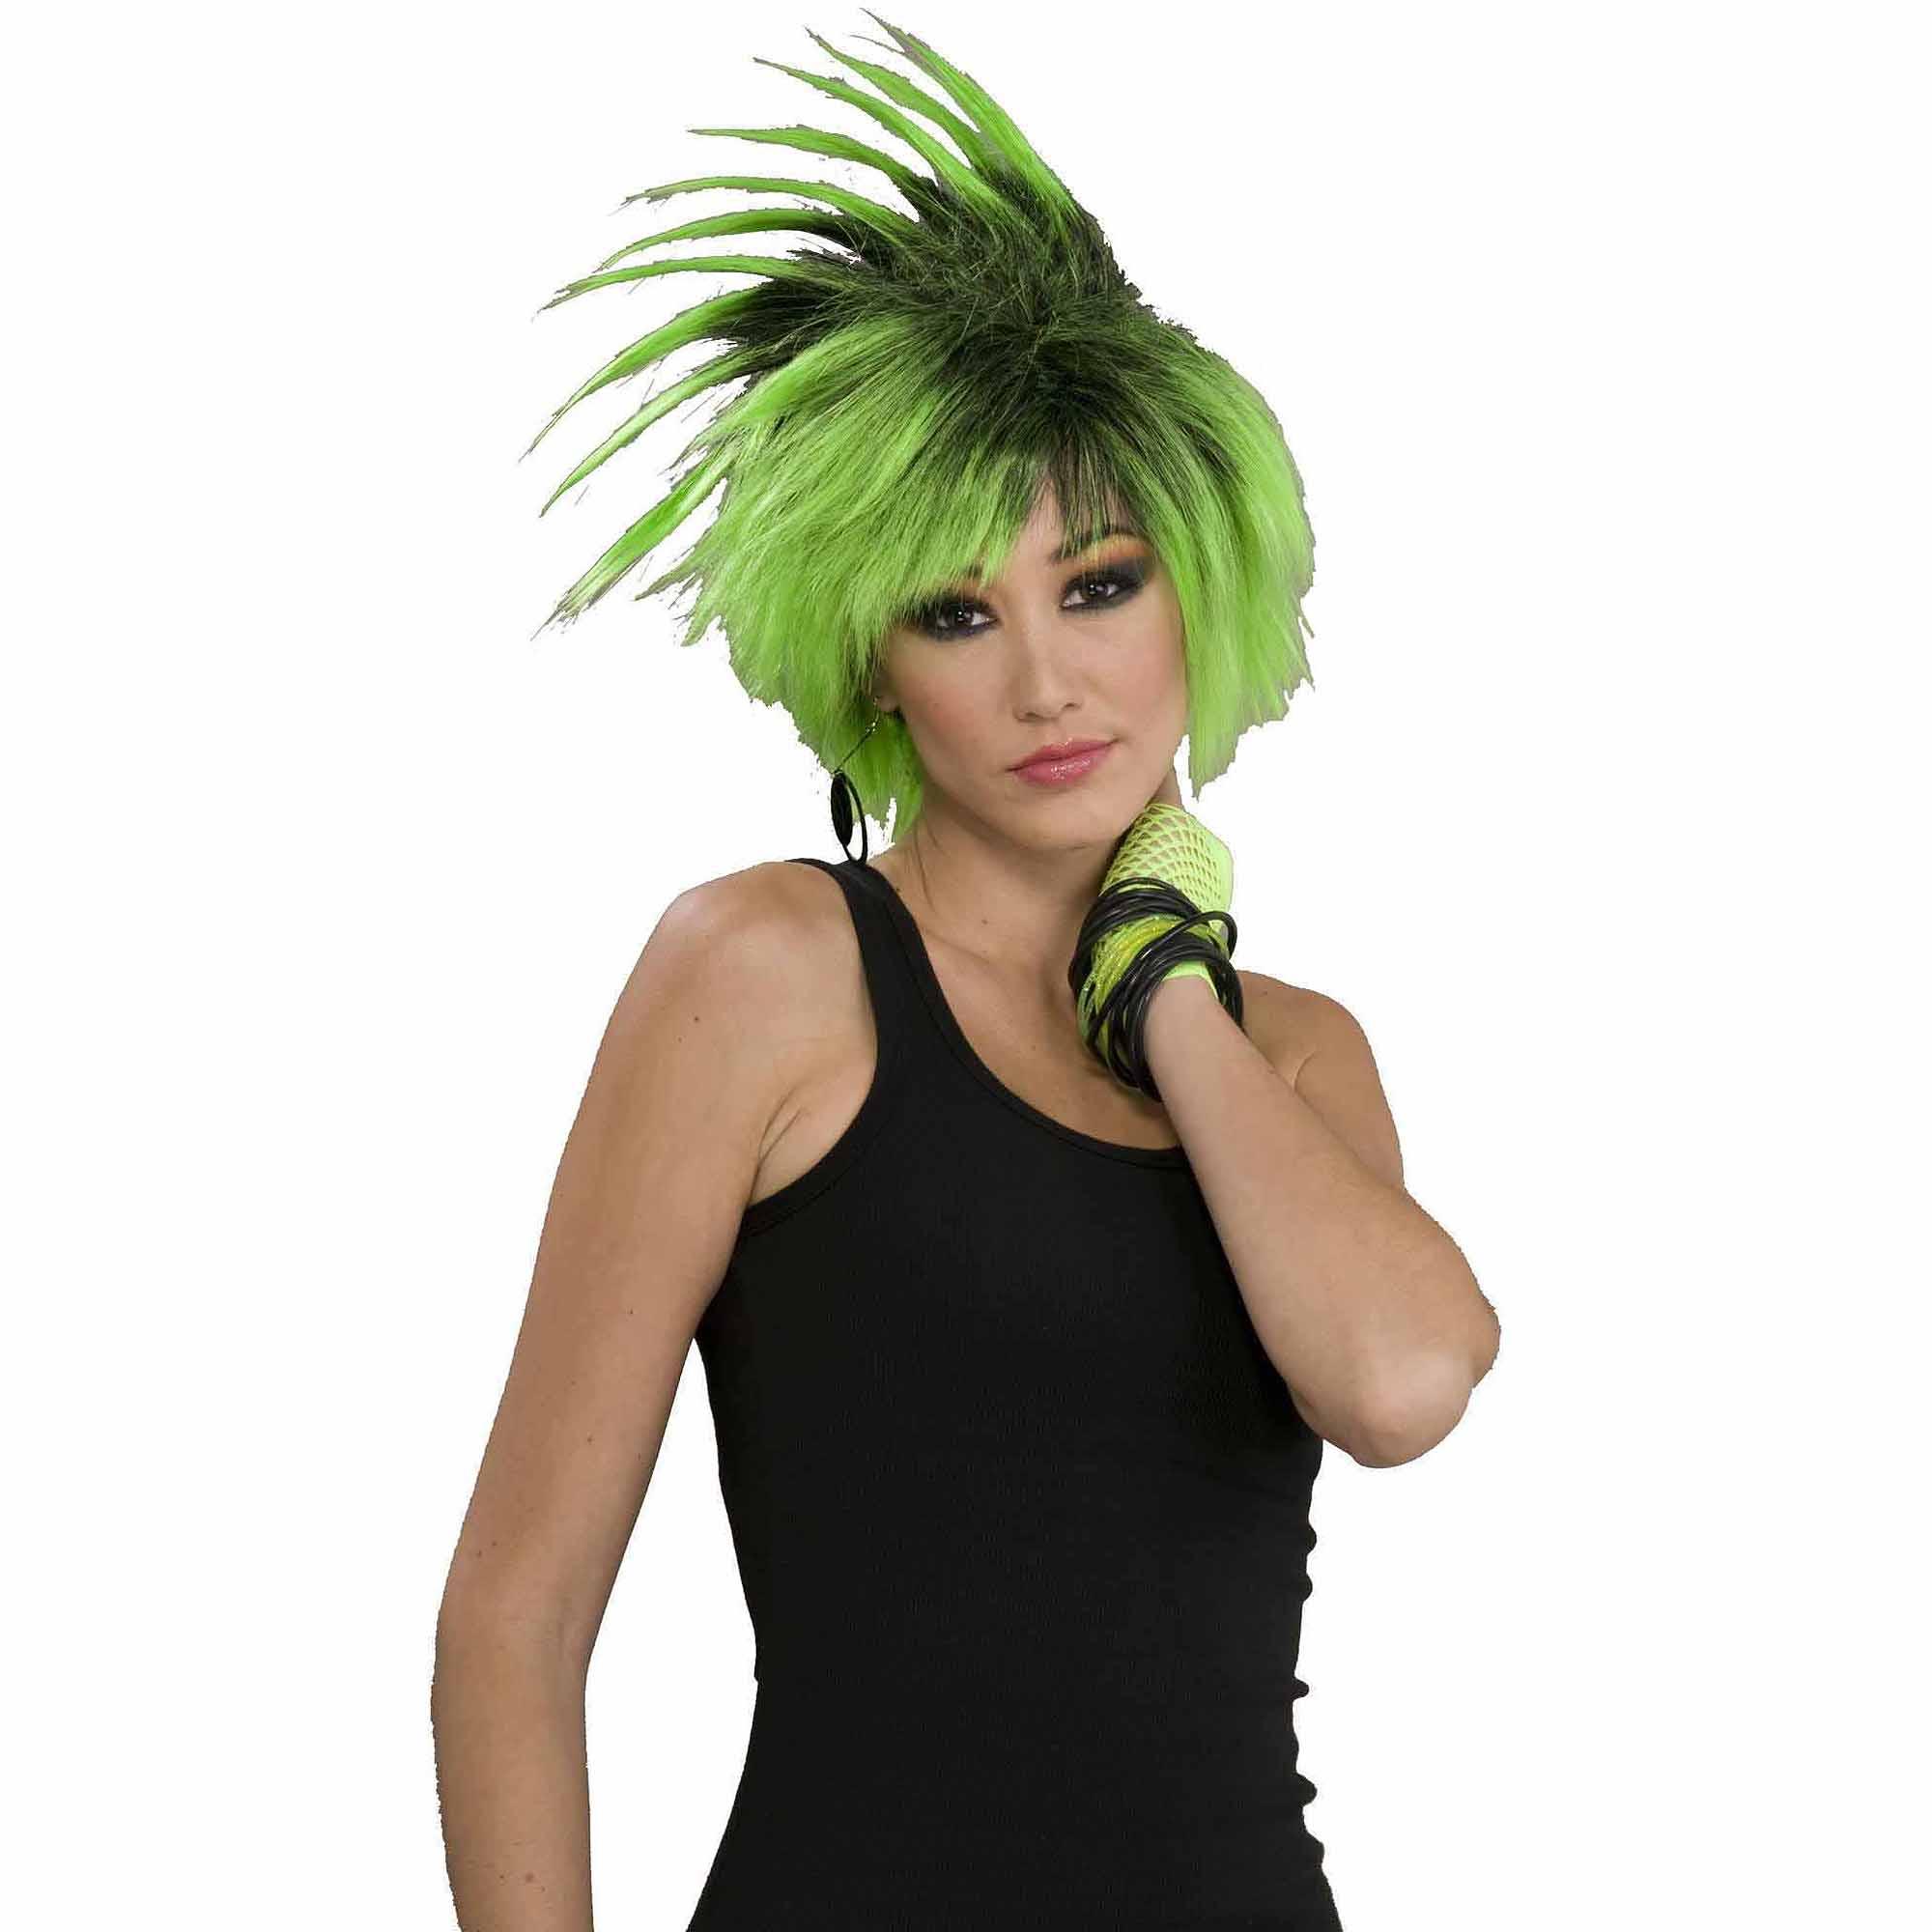 Twist o' Lime Wig Adult Halloween Accessory